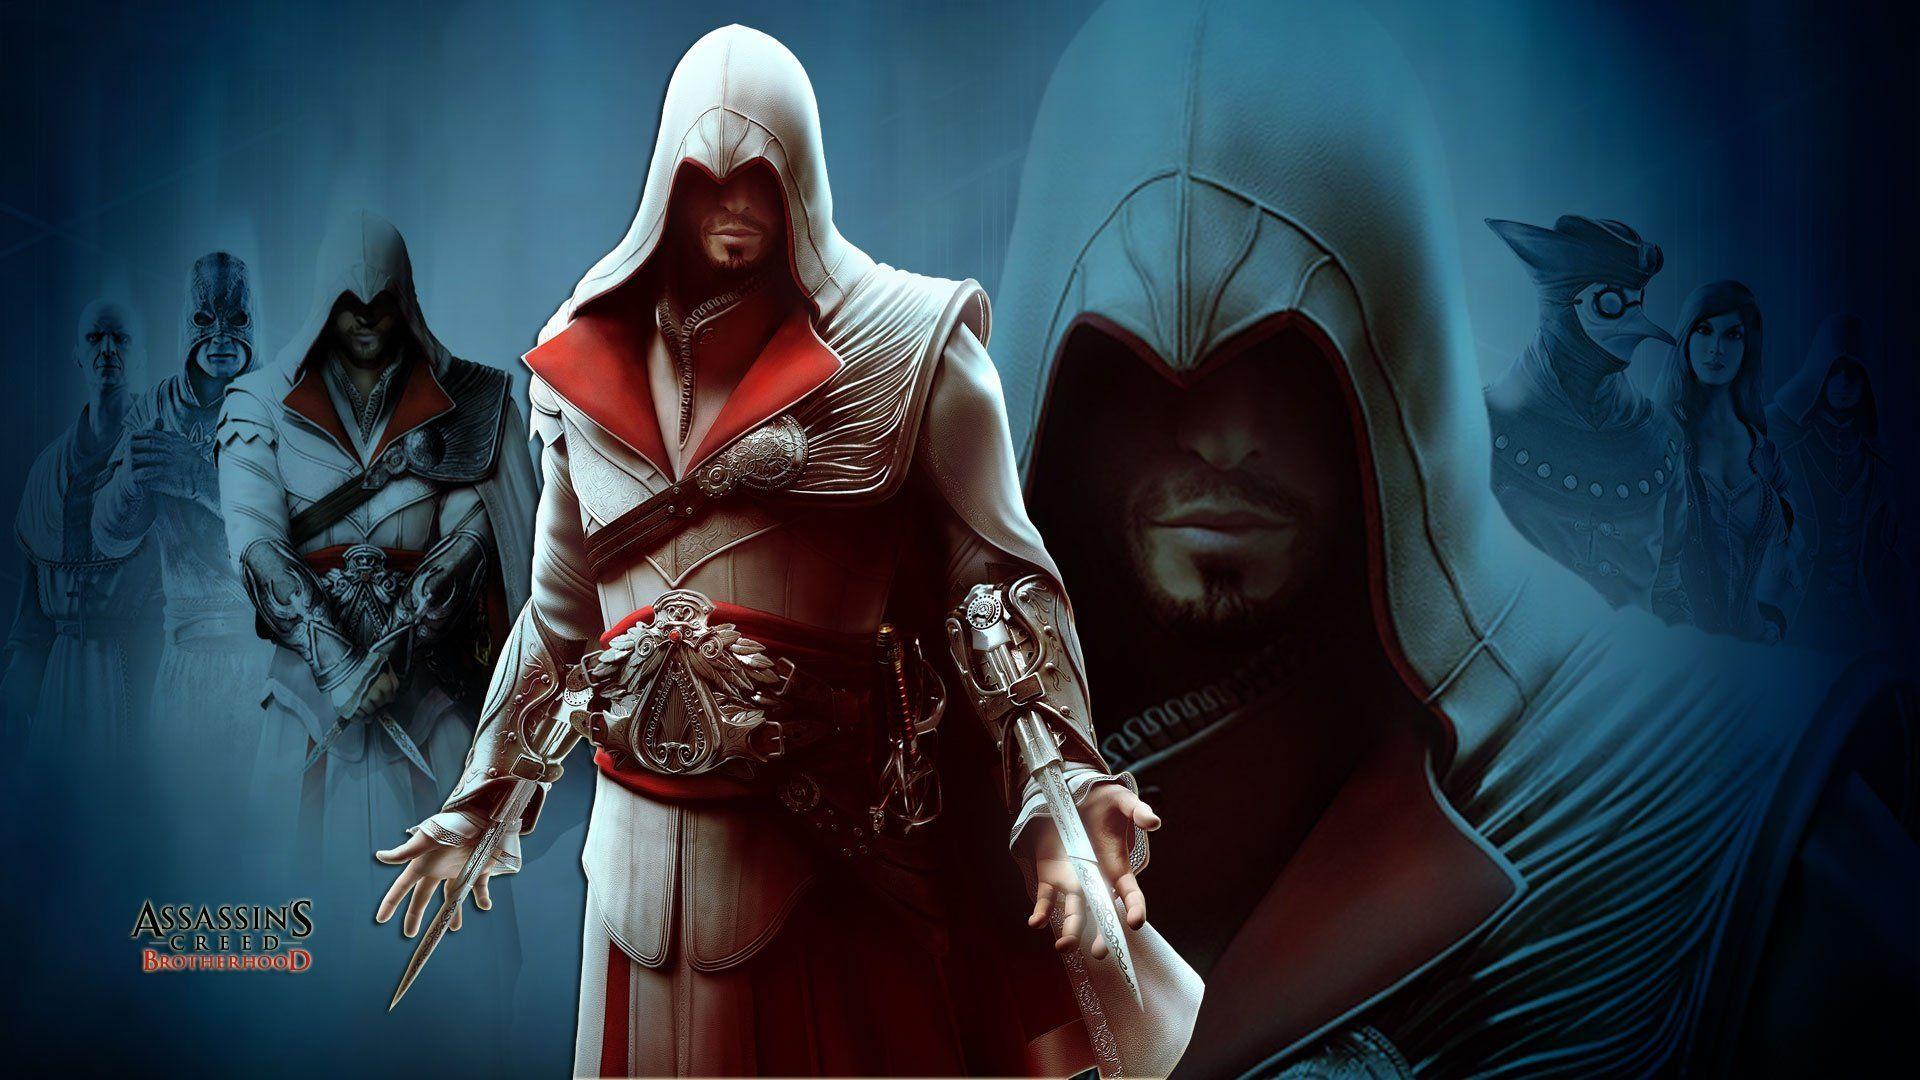 Assassins Creed Brotherhood Wallpaper Free Download